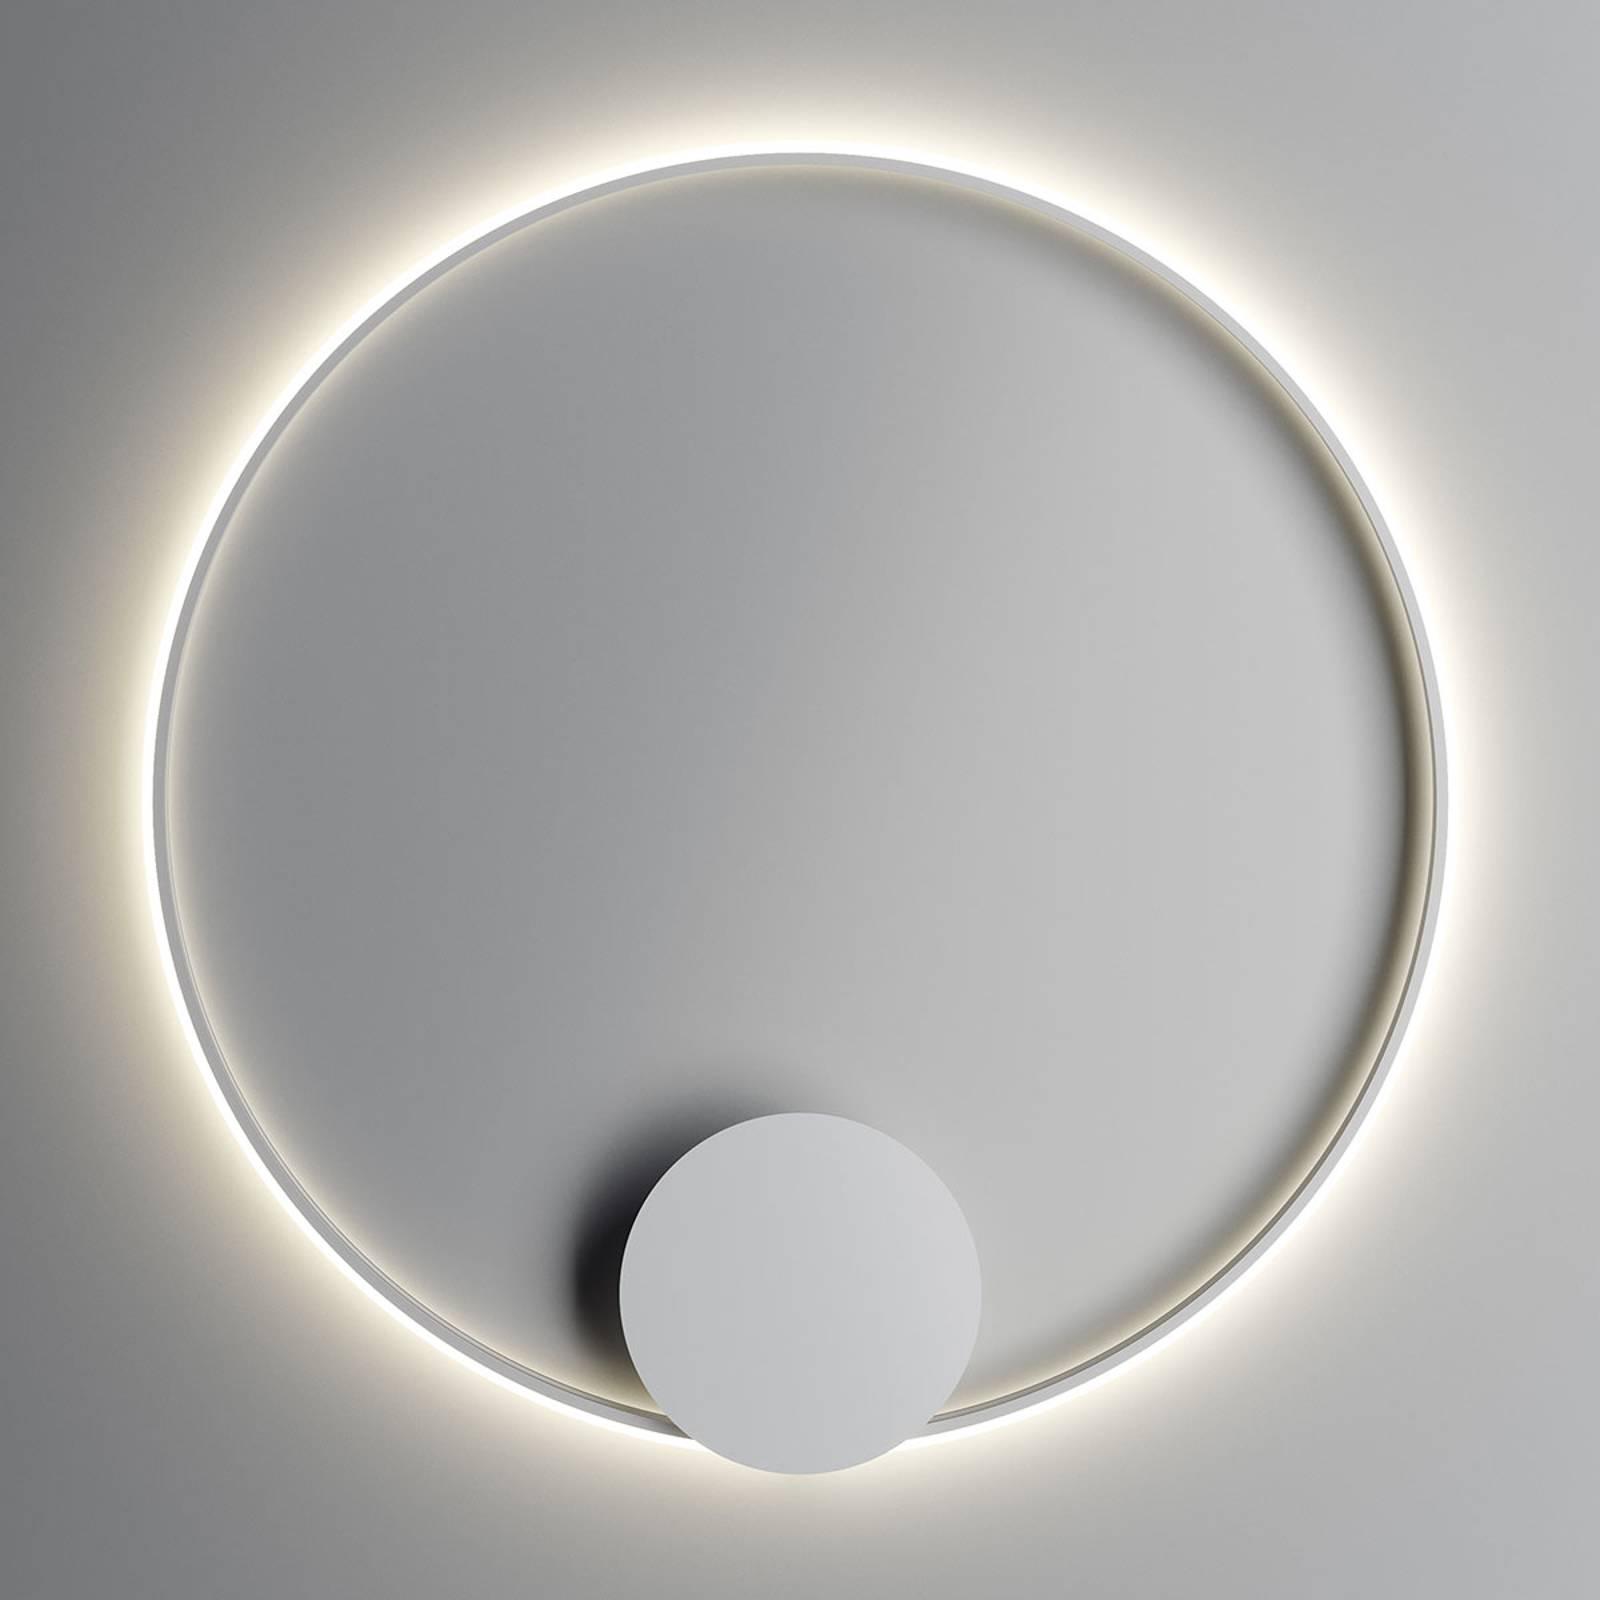 Fabbian Olympic LED-Wandleuchte Ø 110 cm weiß